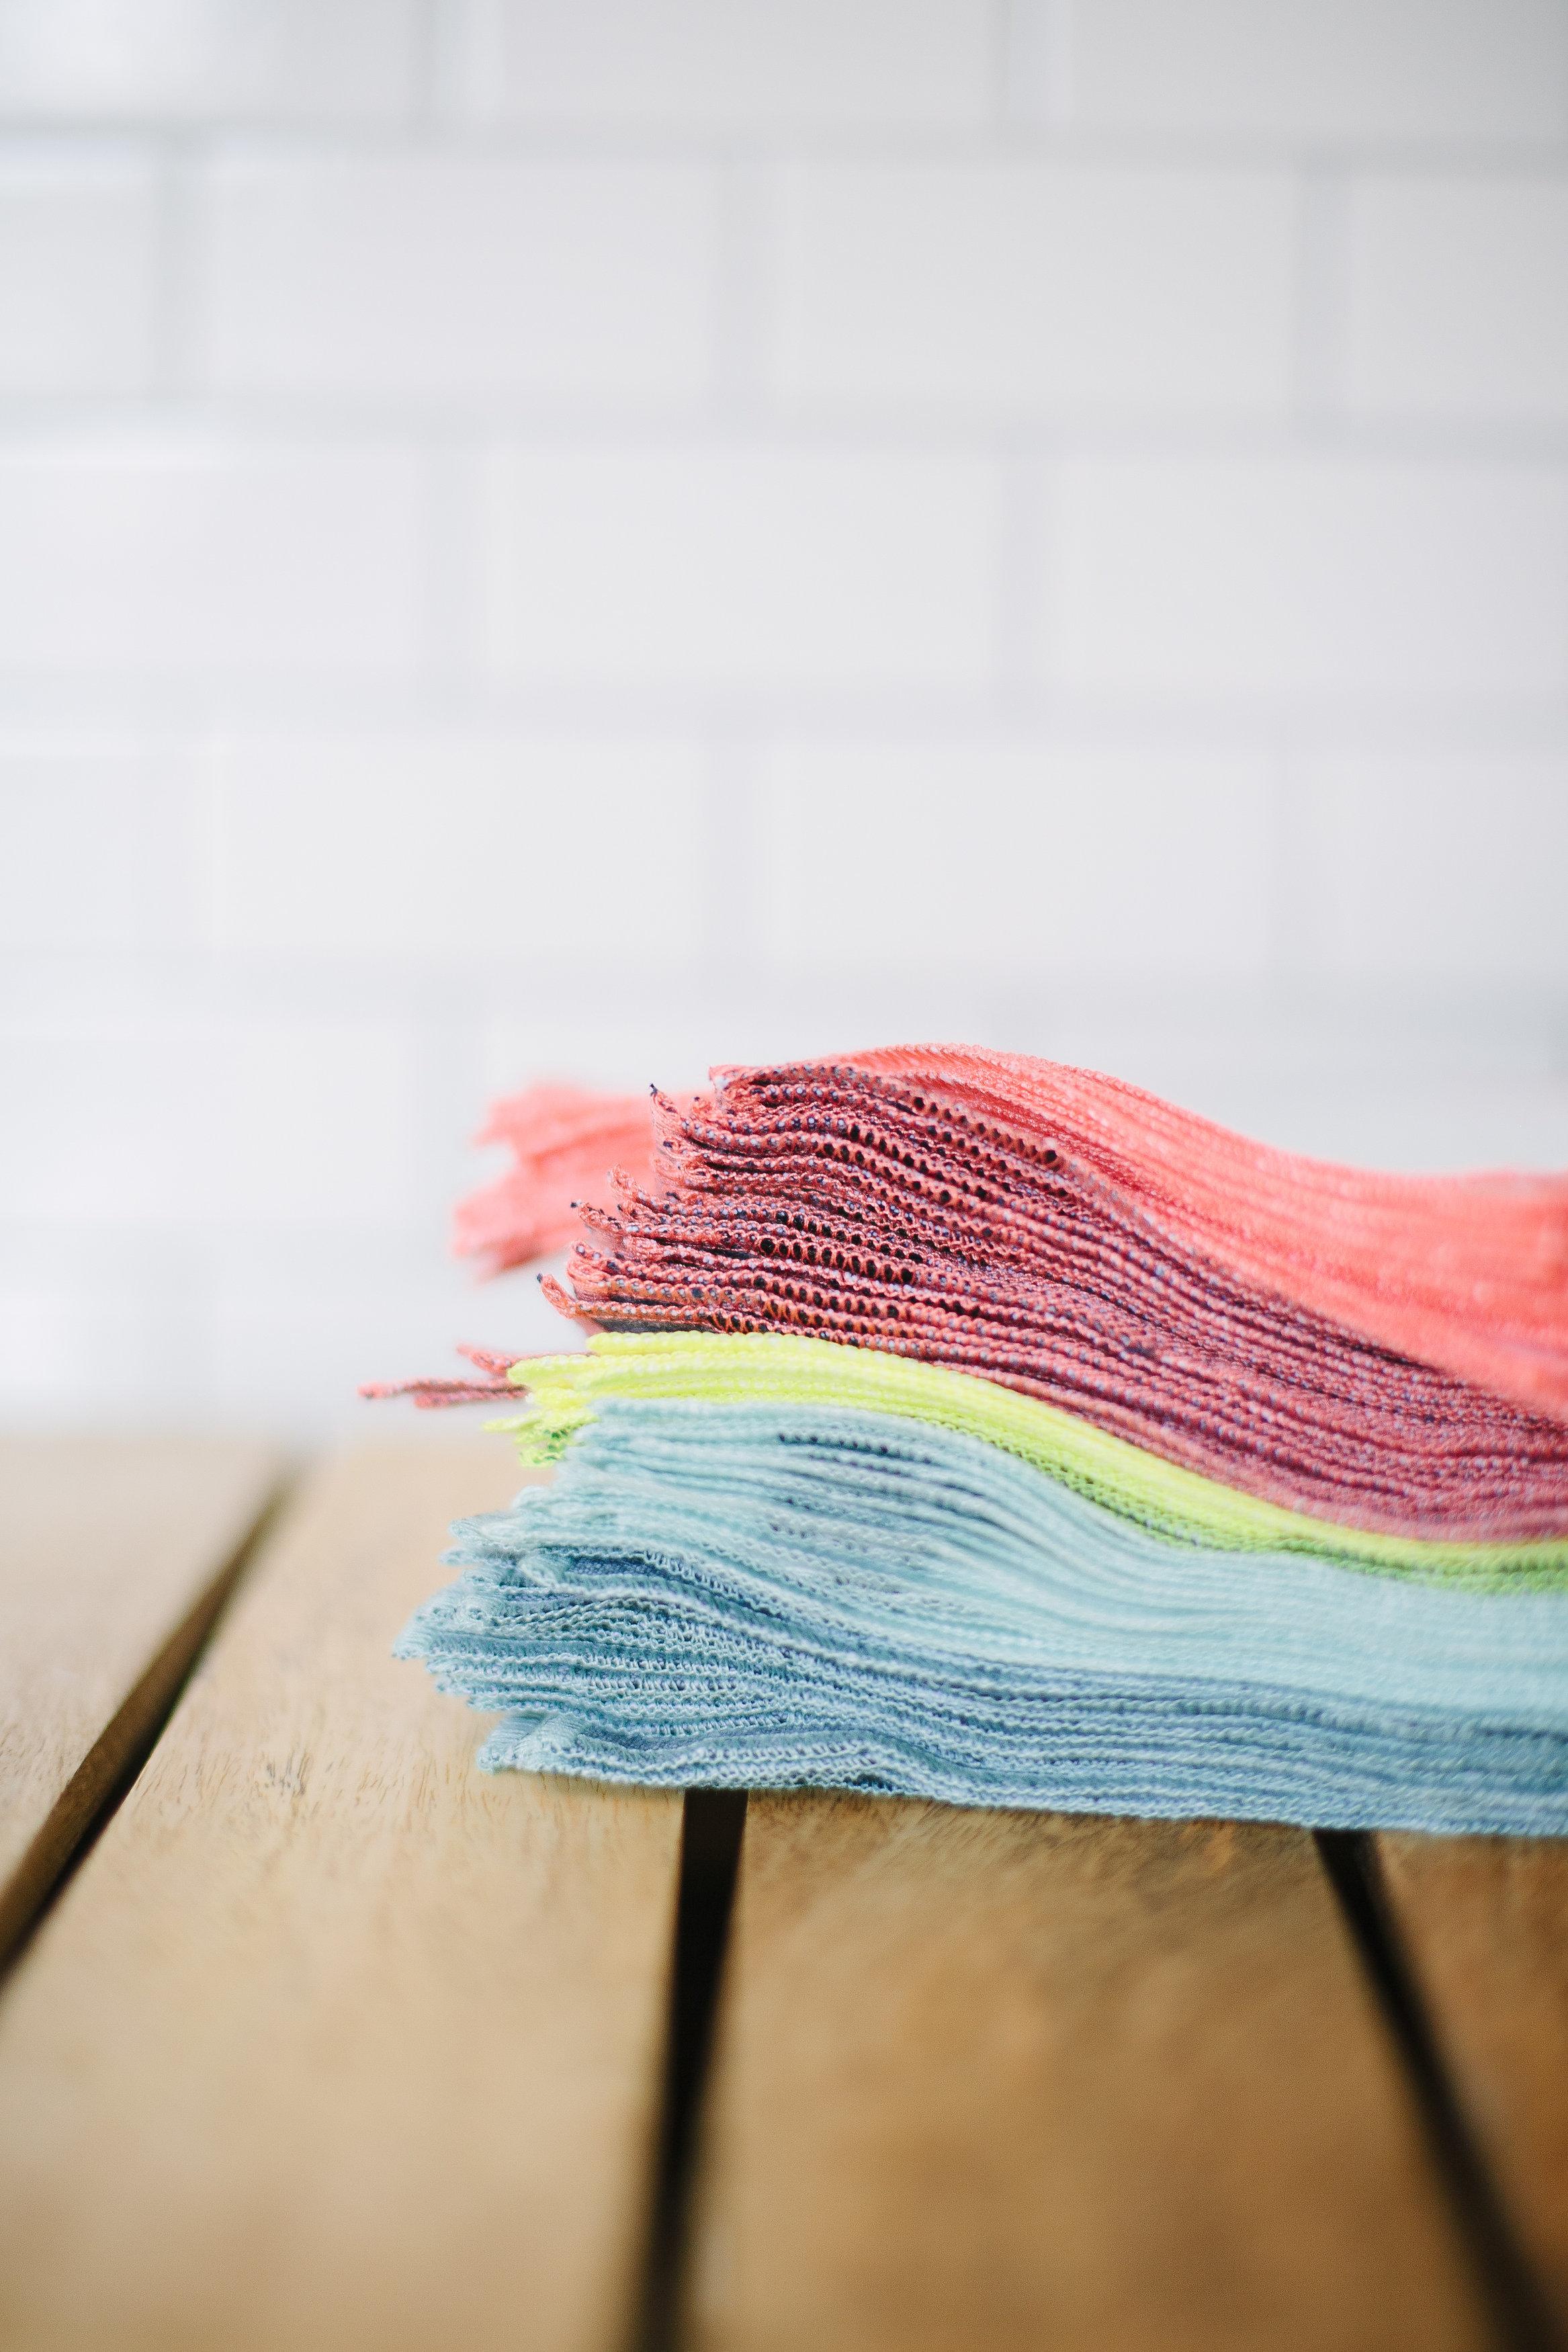 everyday-napkin-studio-nouveau-139.jpg